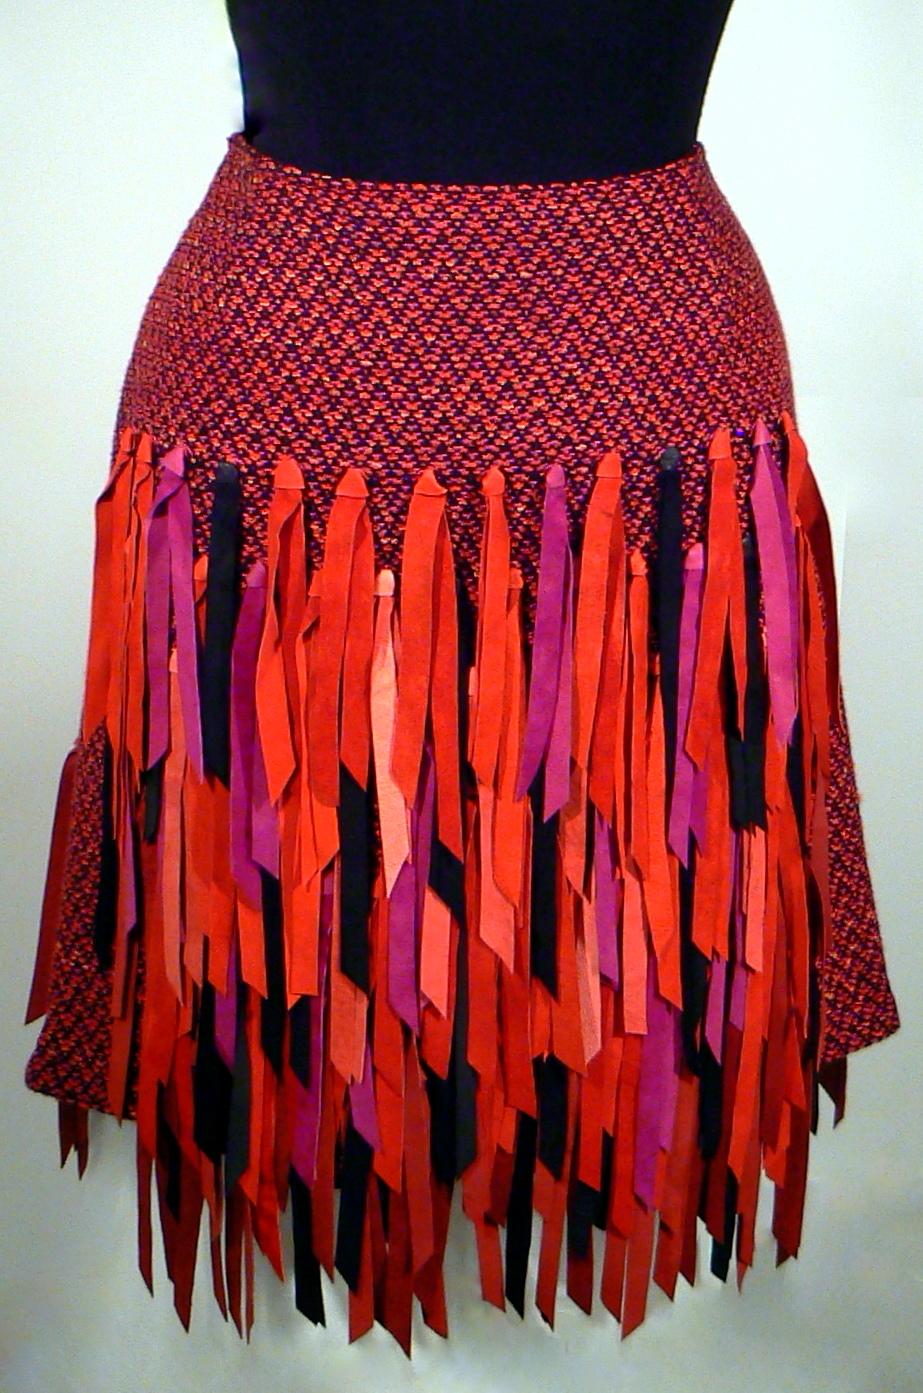 Leather Skirt K Weir-West 2.JPG